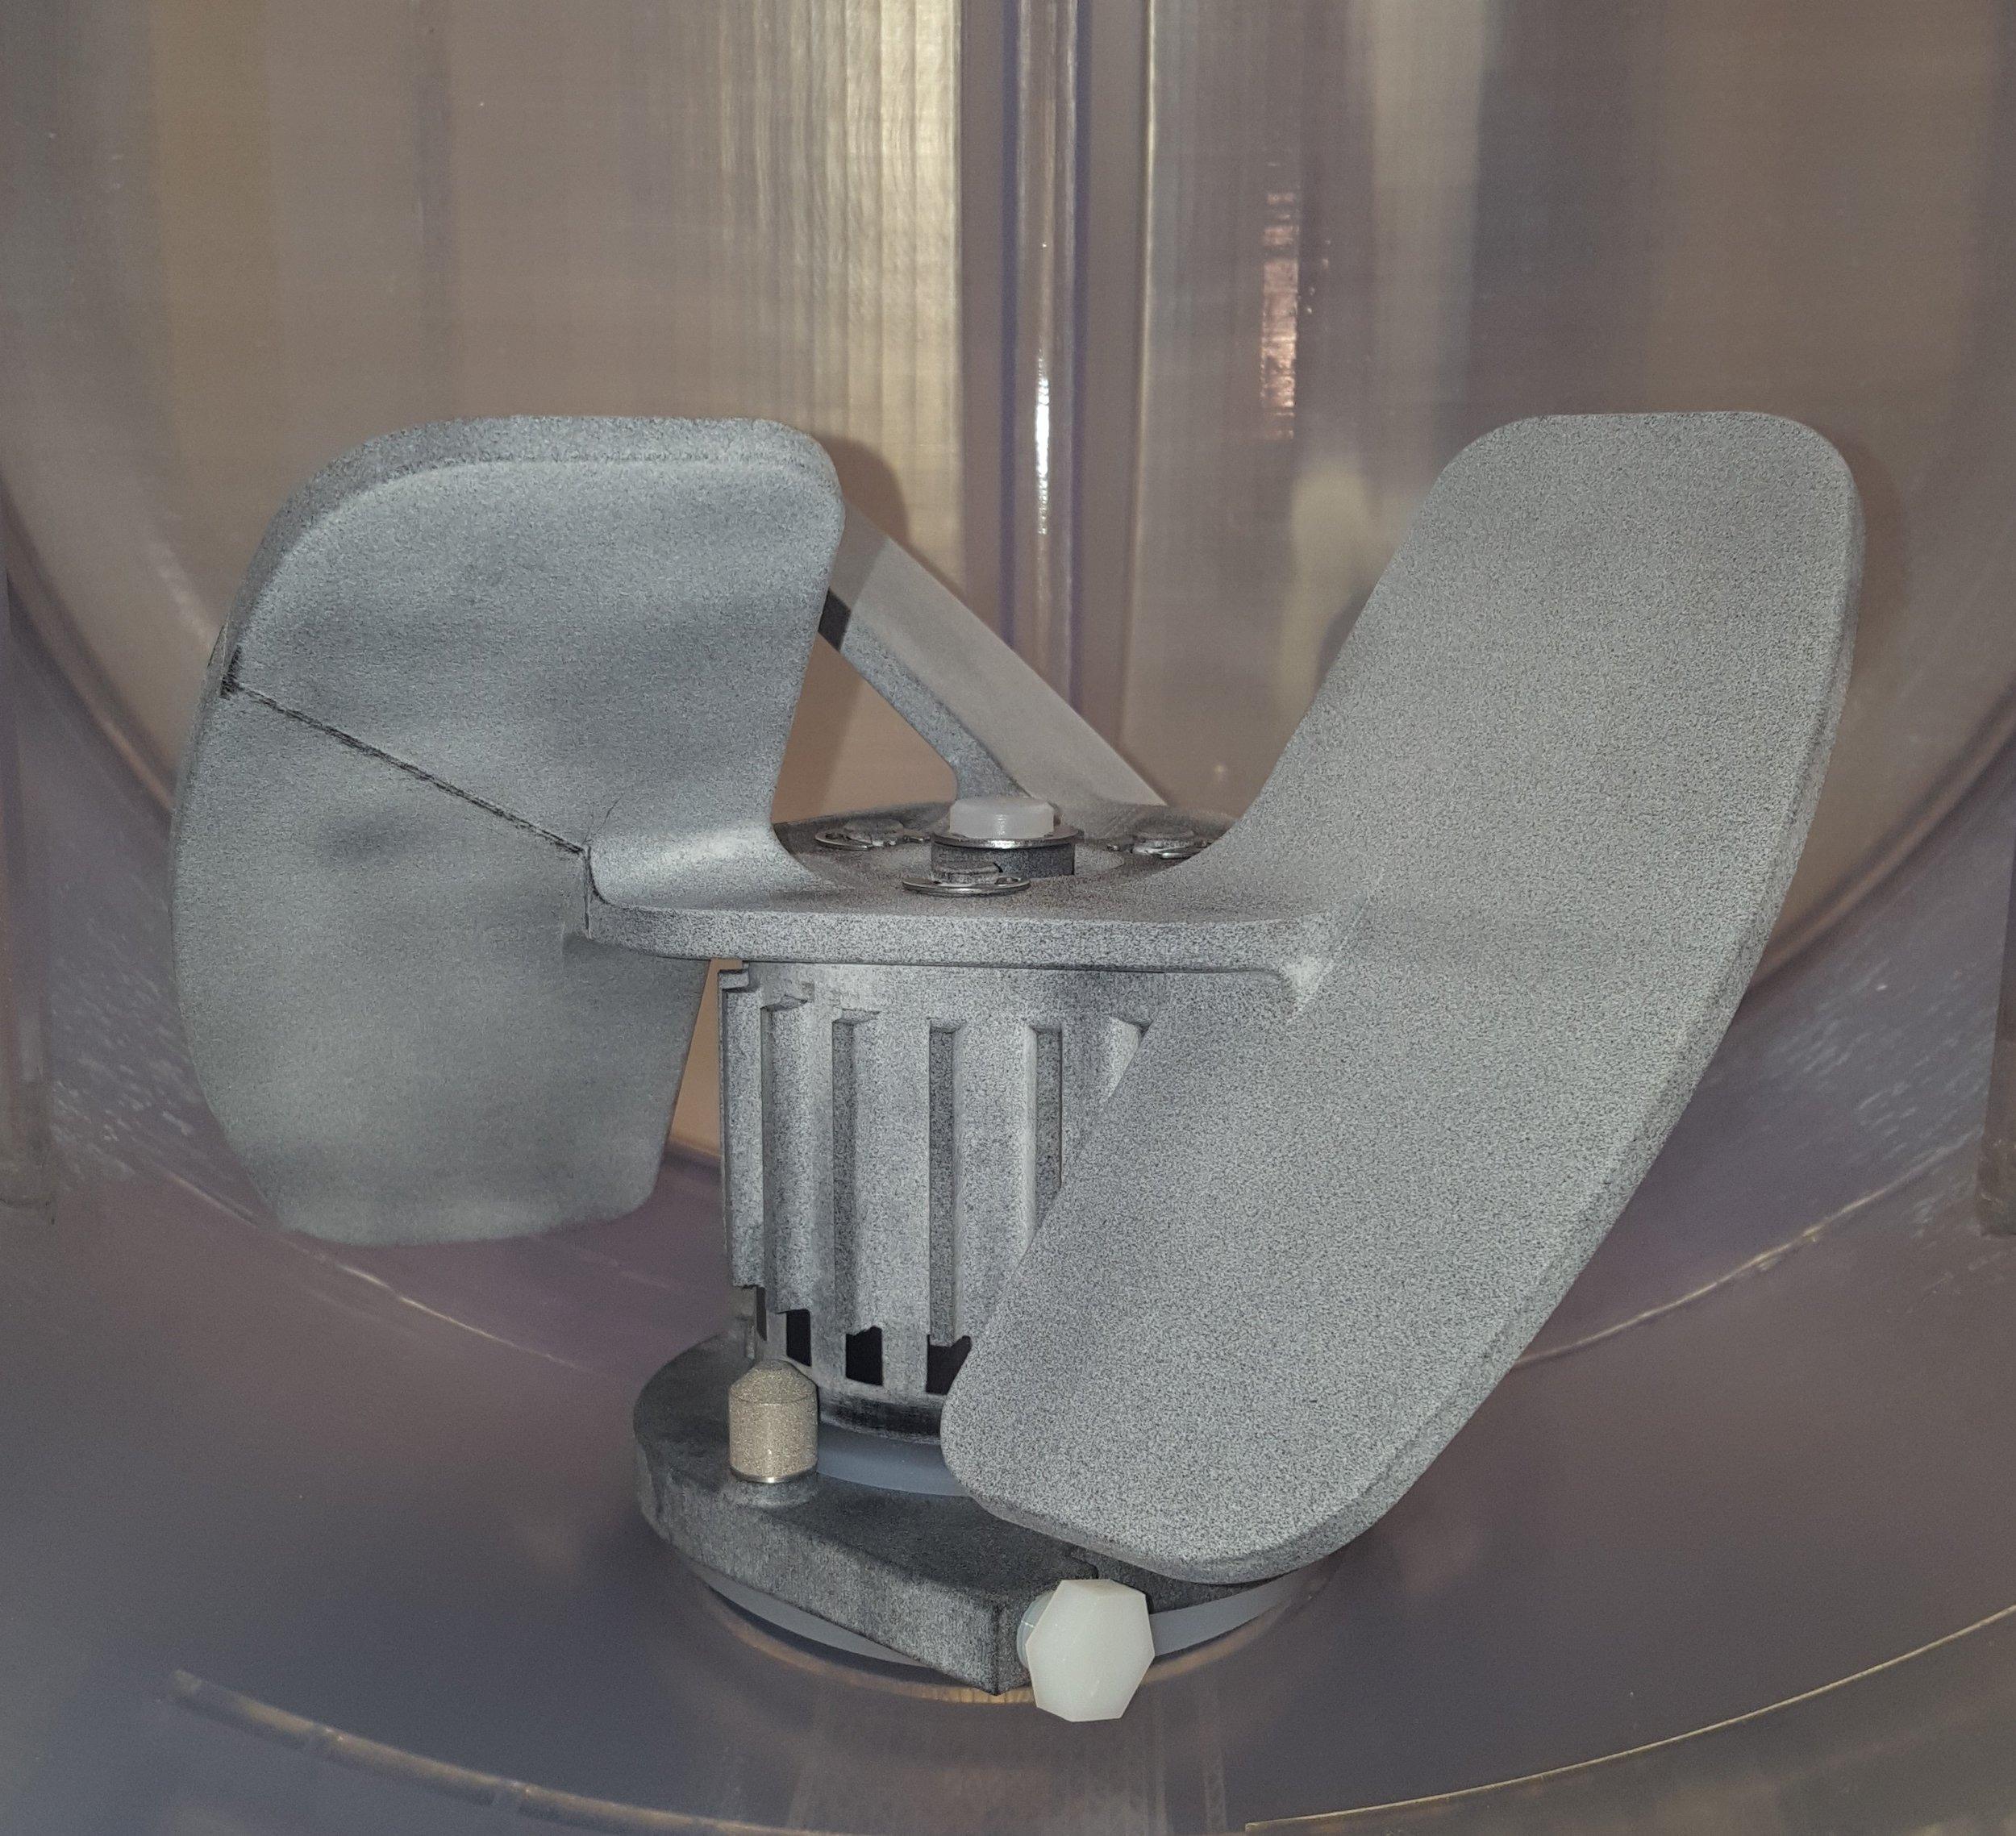 Model NH50-CC system